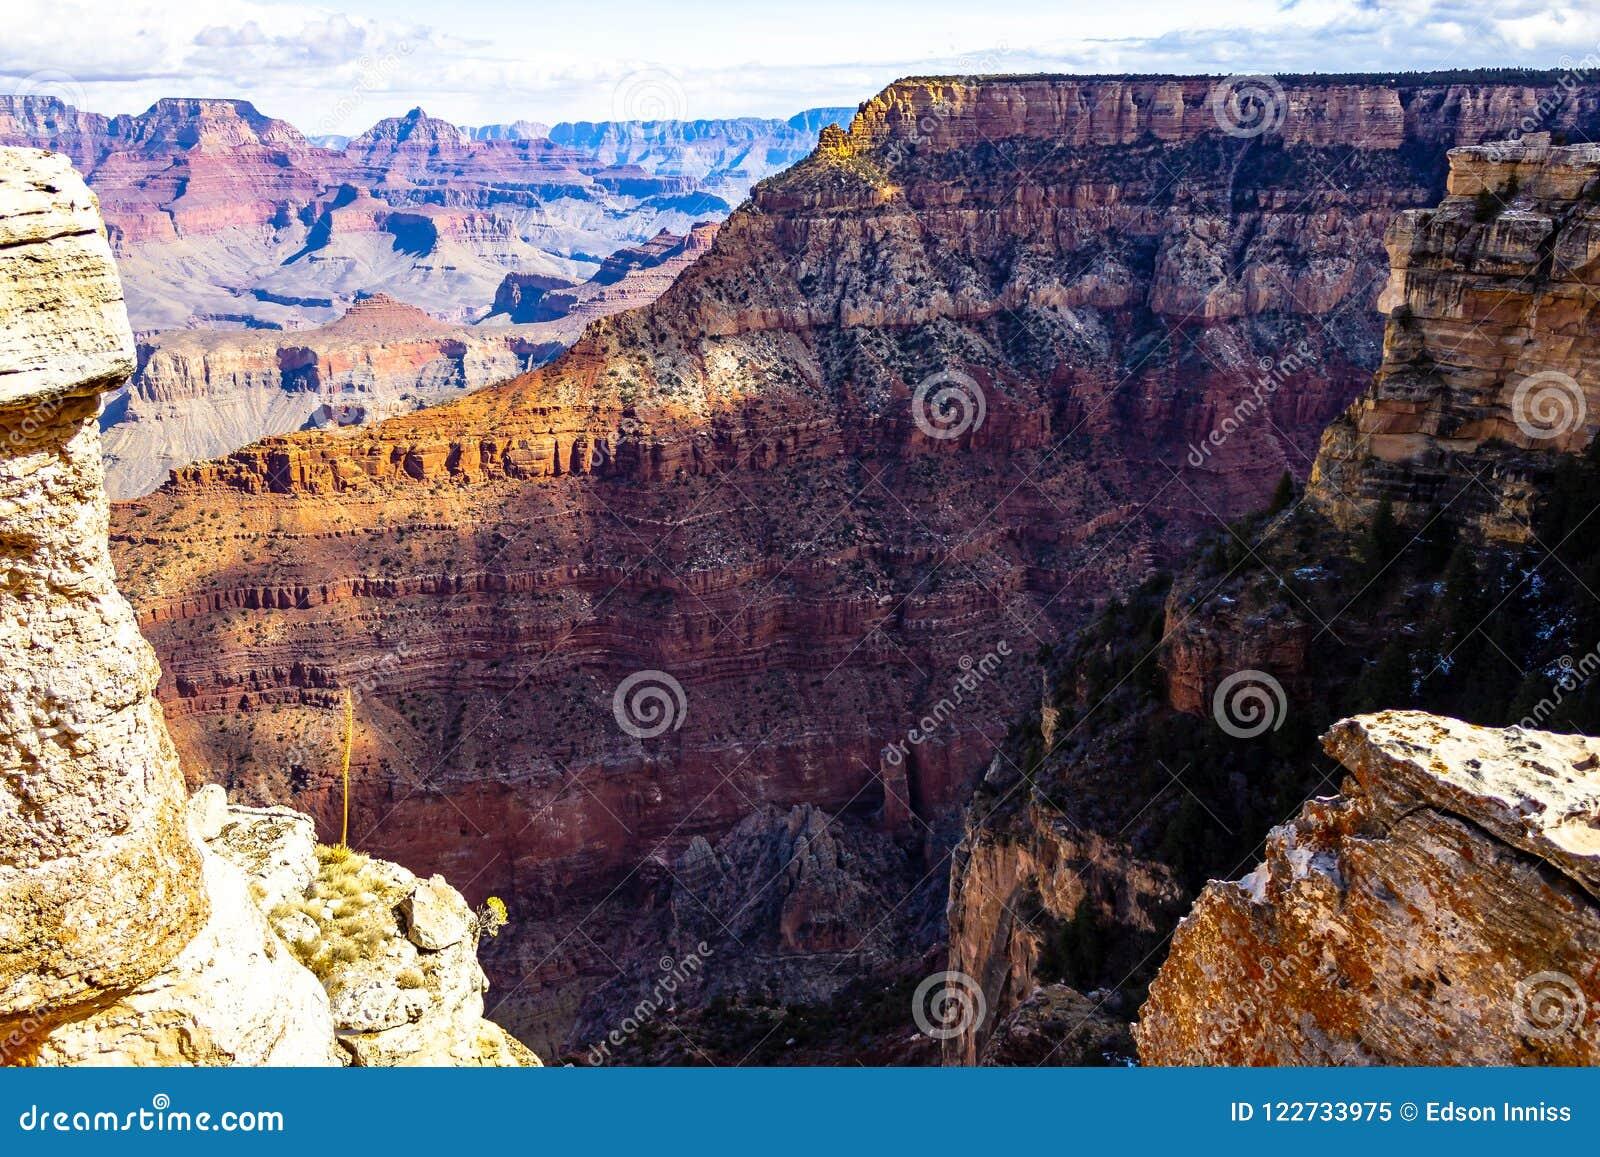 Grand Canyon National Park South Rim Arizona Usa Stock Image